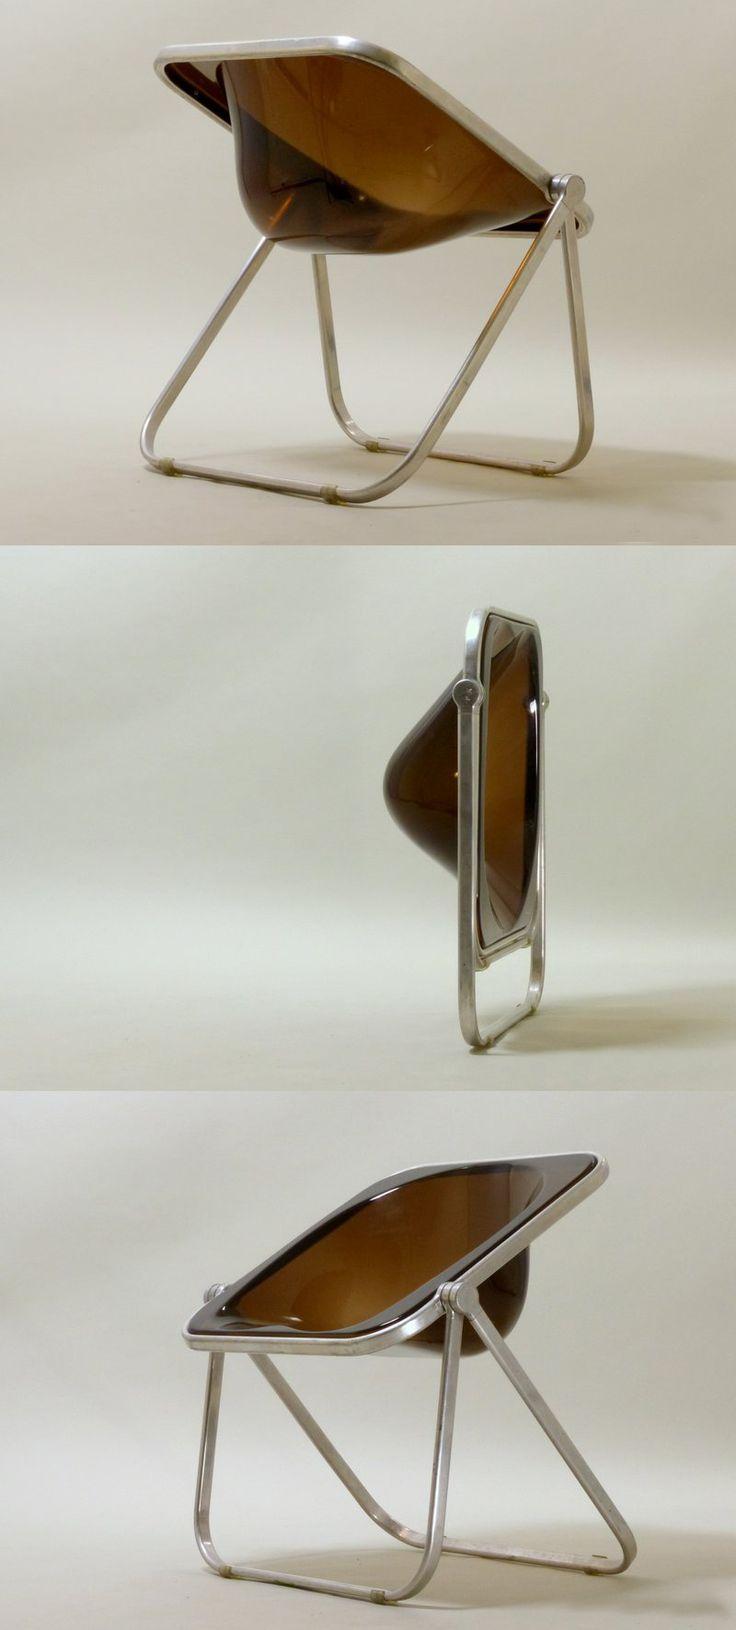 Giancarlo Piretti Plona Folding Chair for Castelli